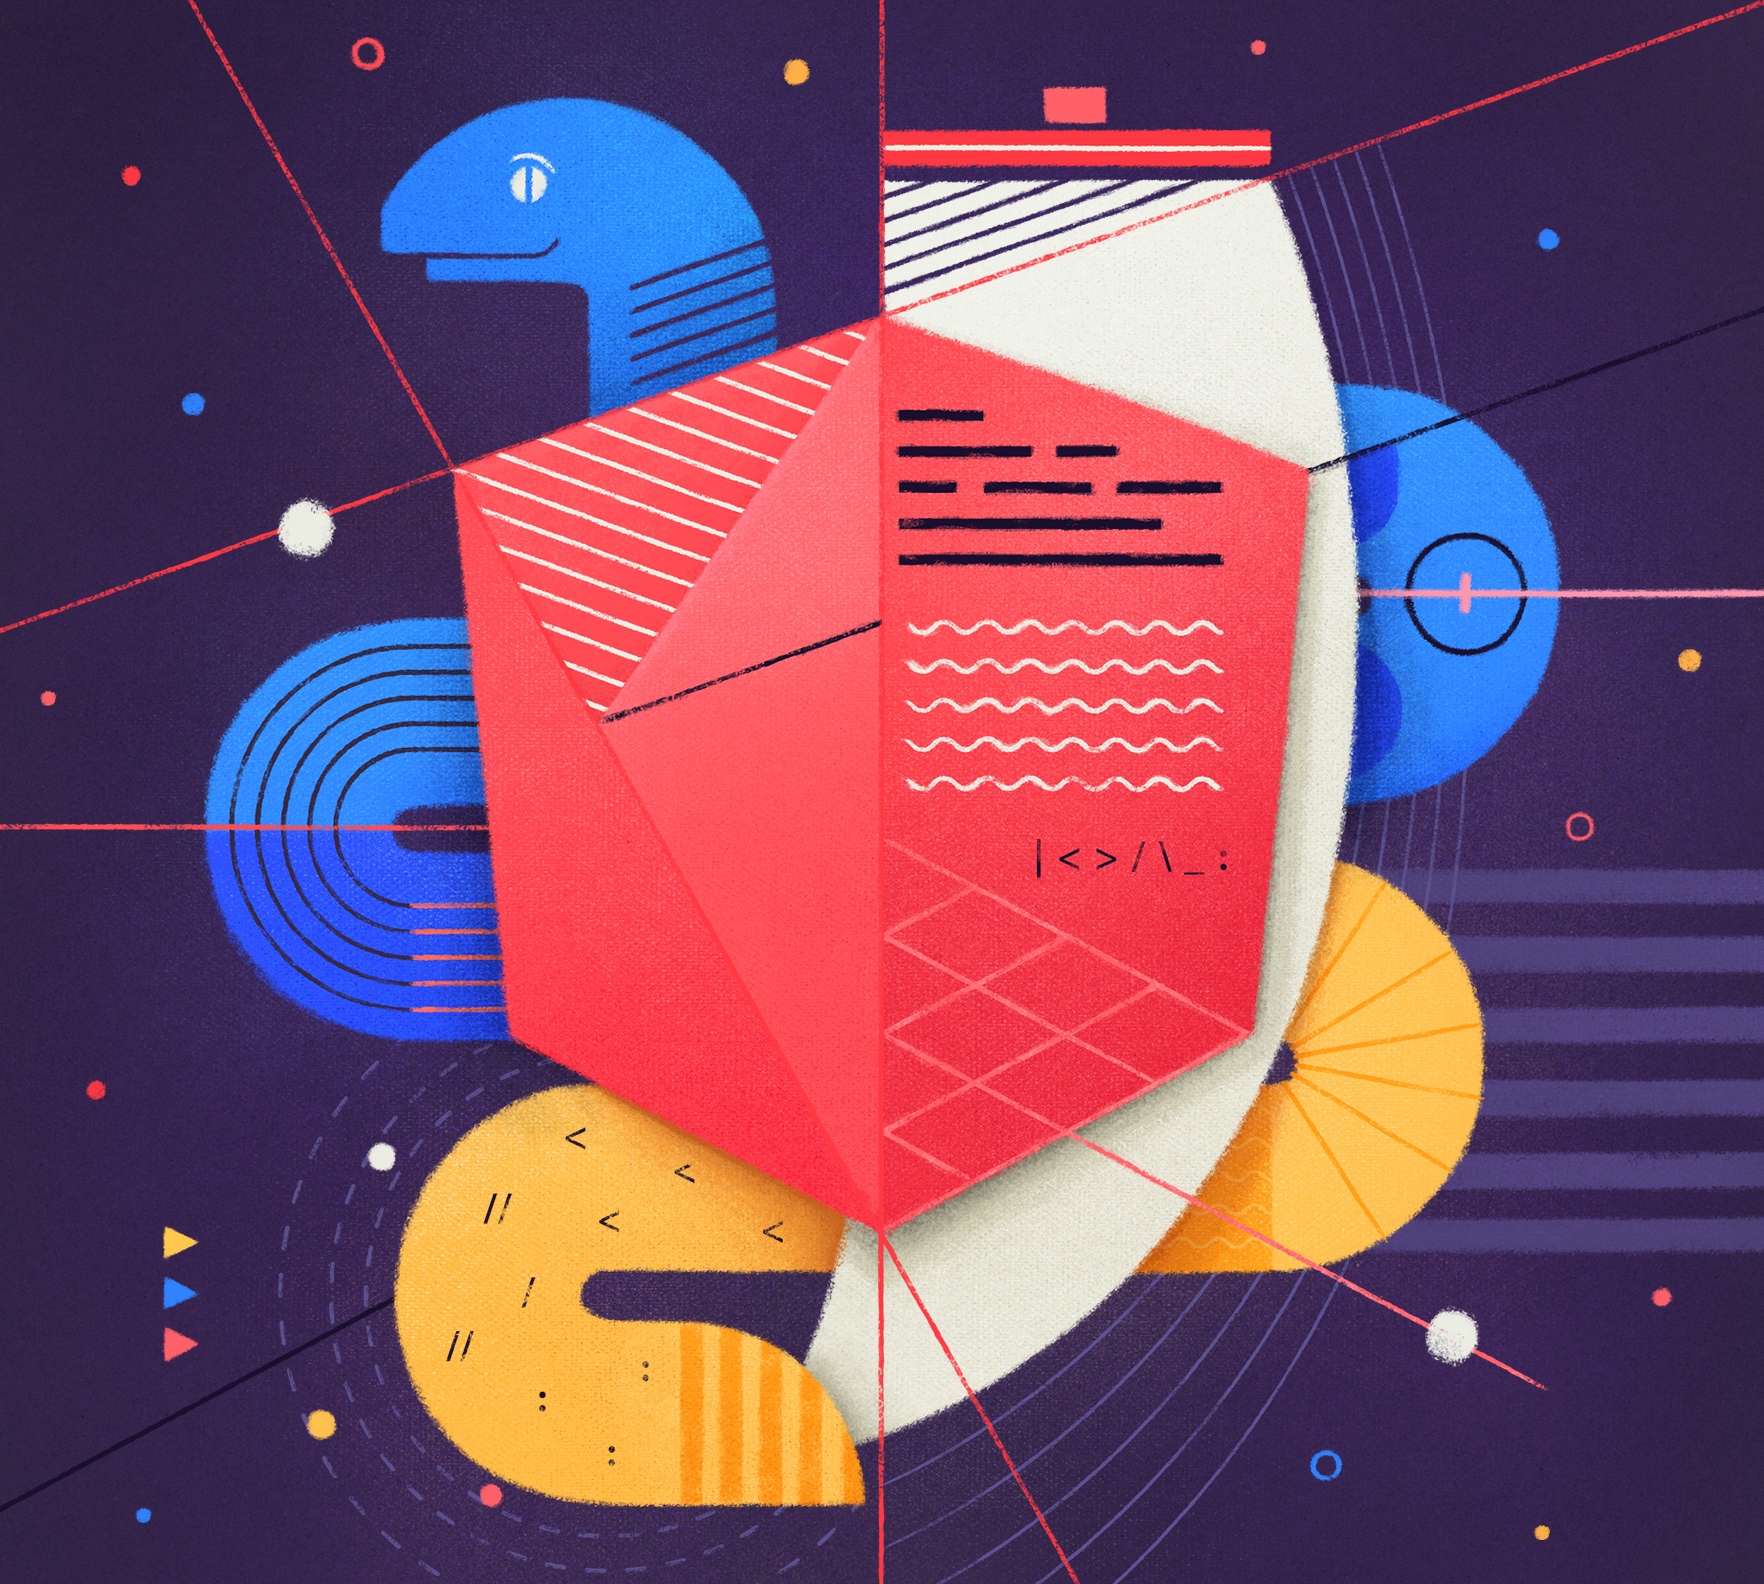 Opencv python install